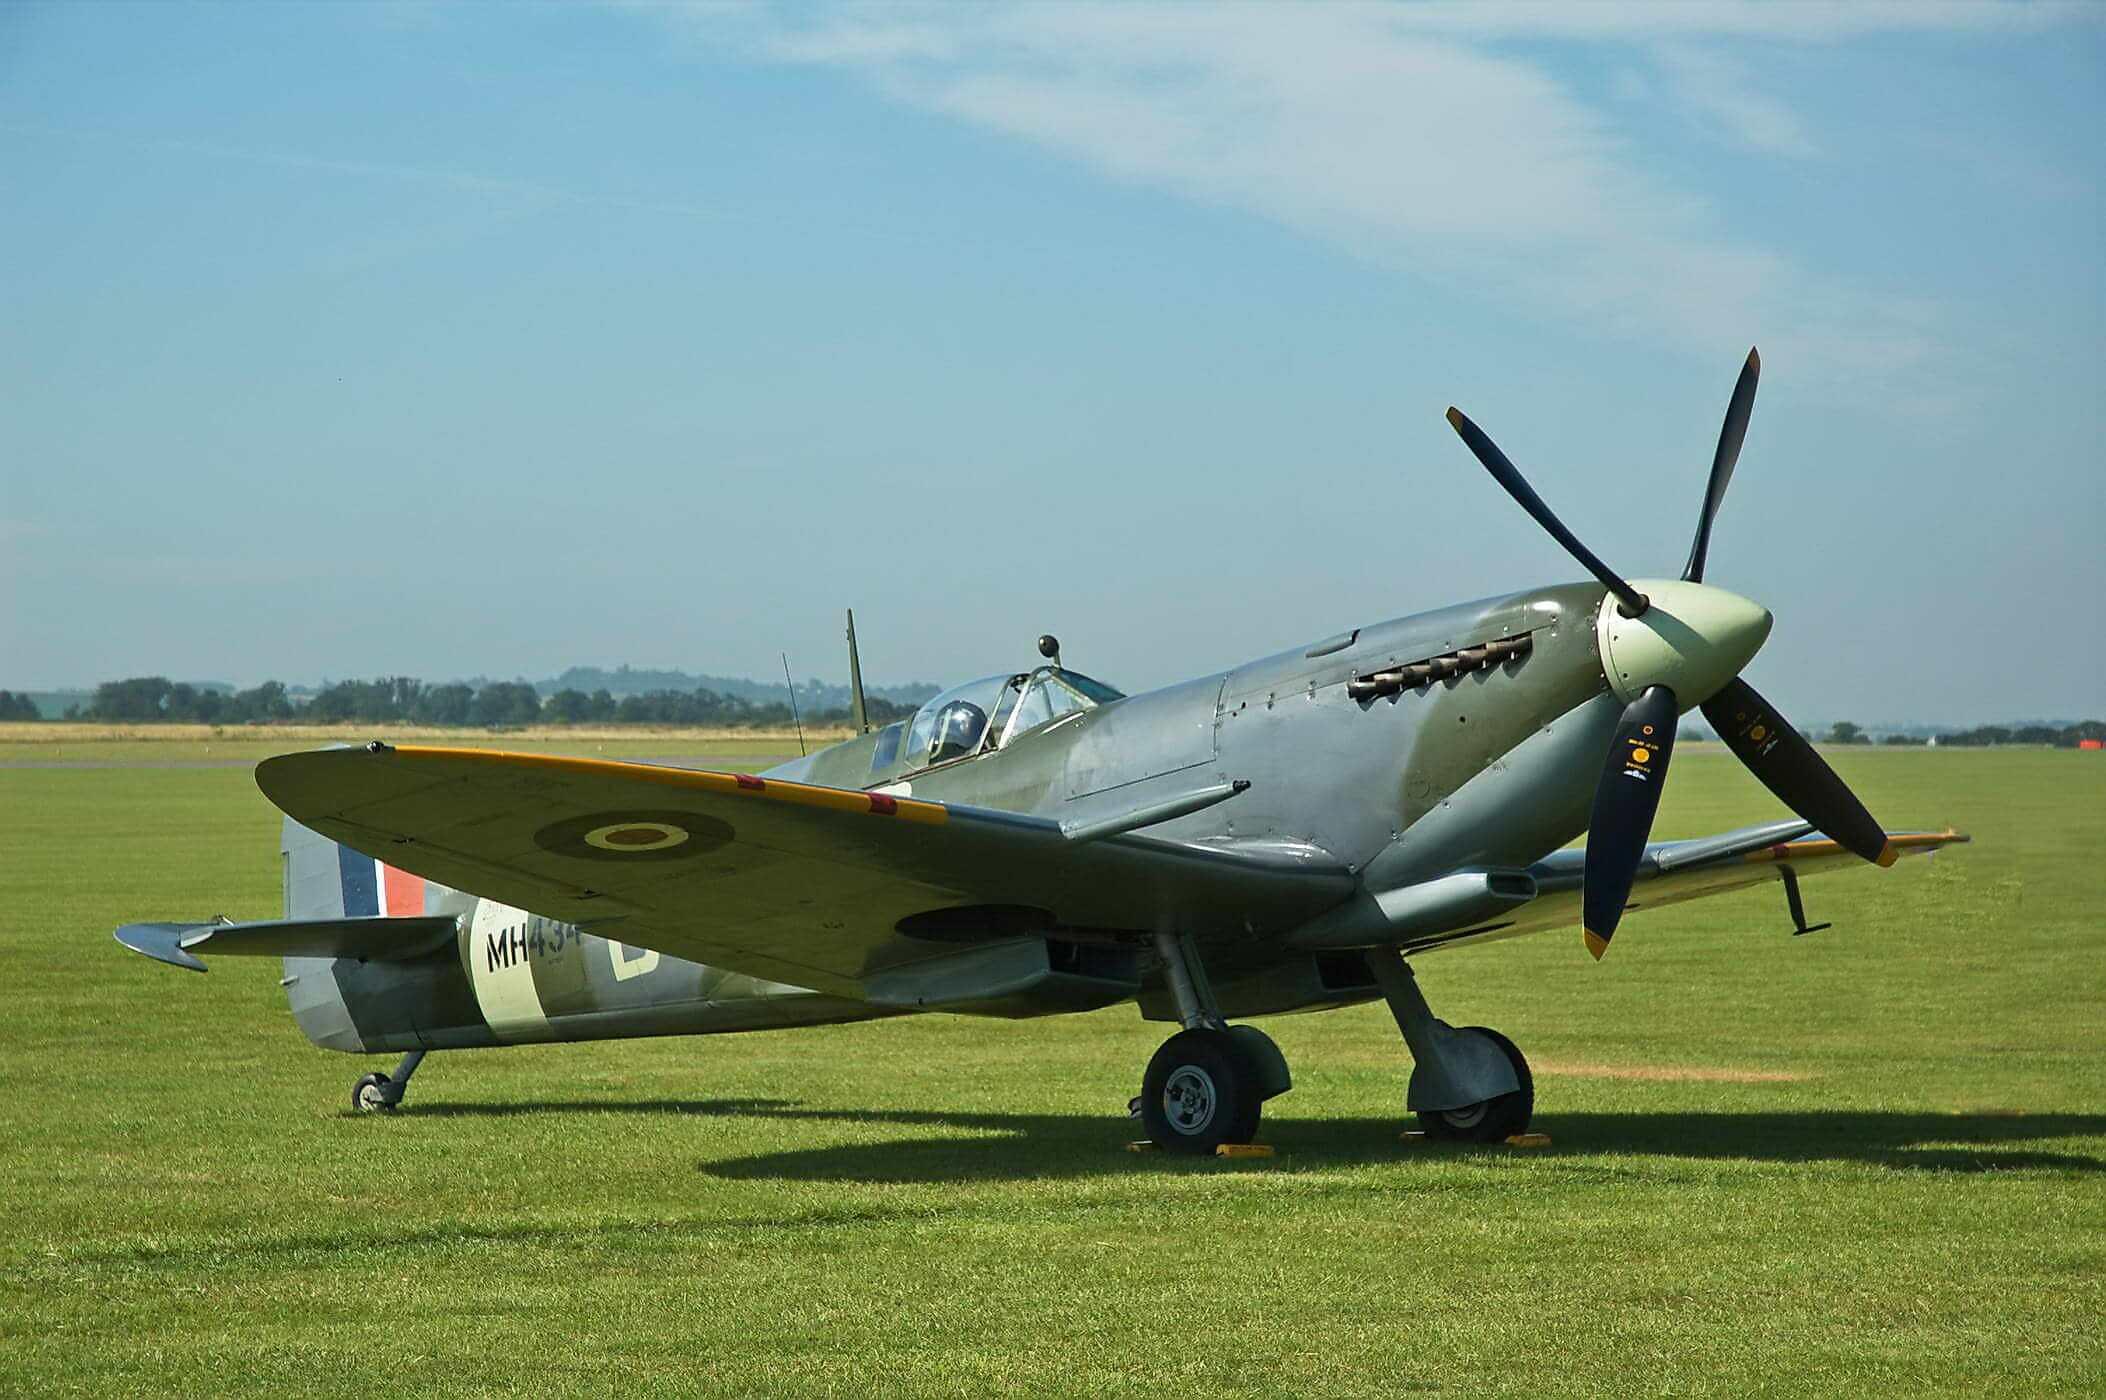 Spitfire LF IXC MH434